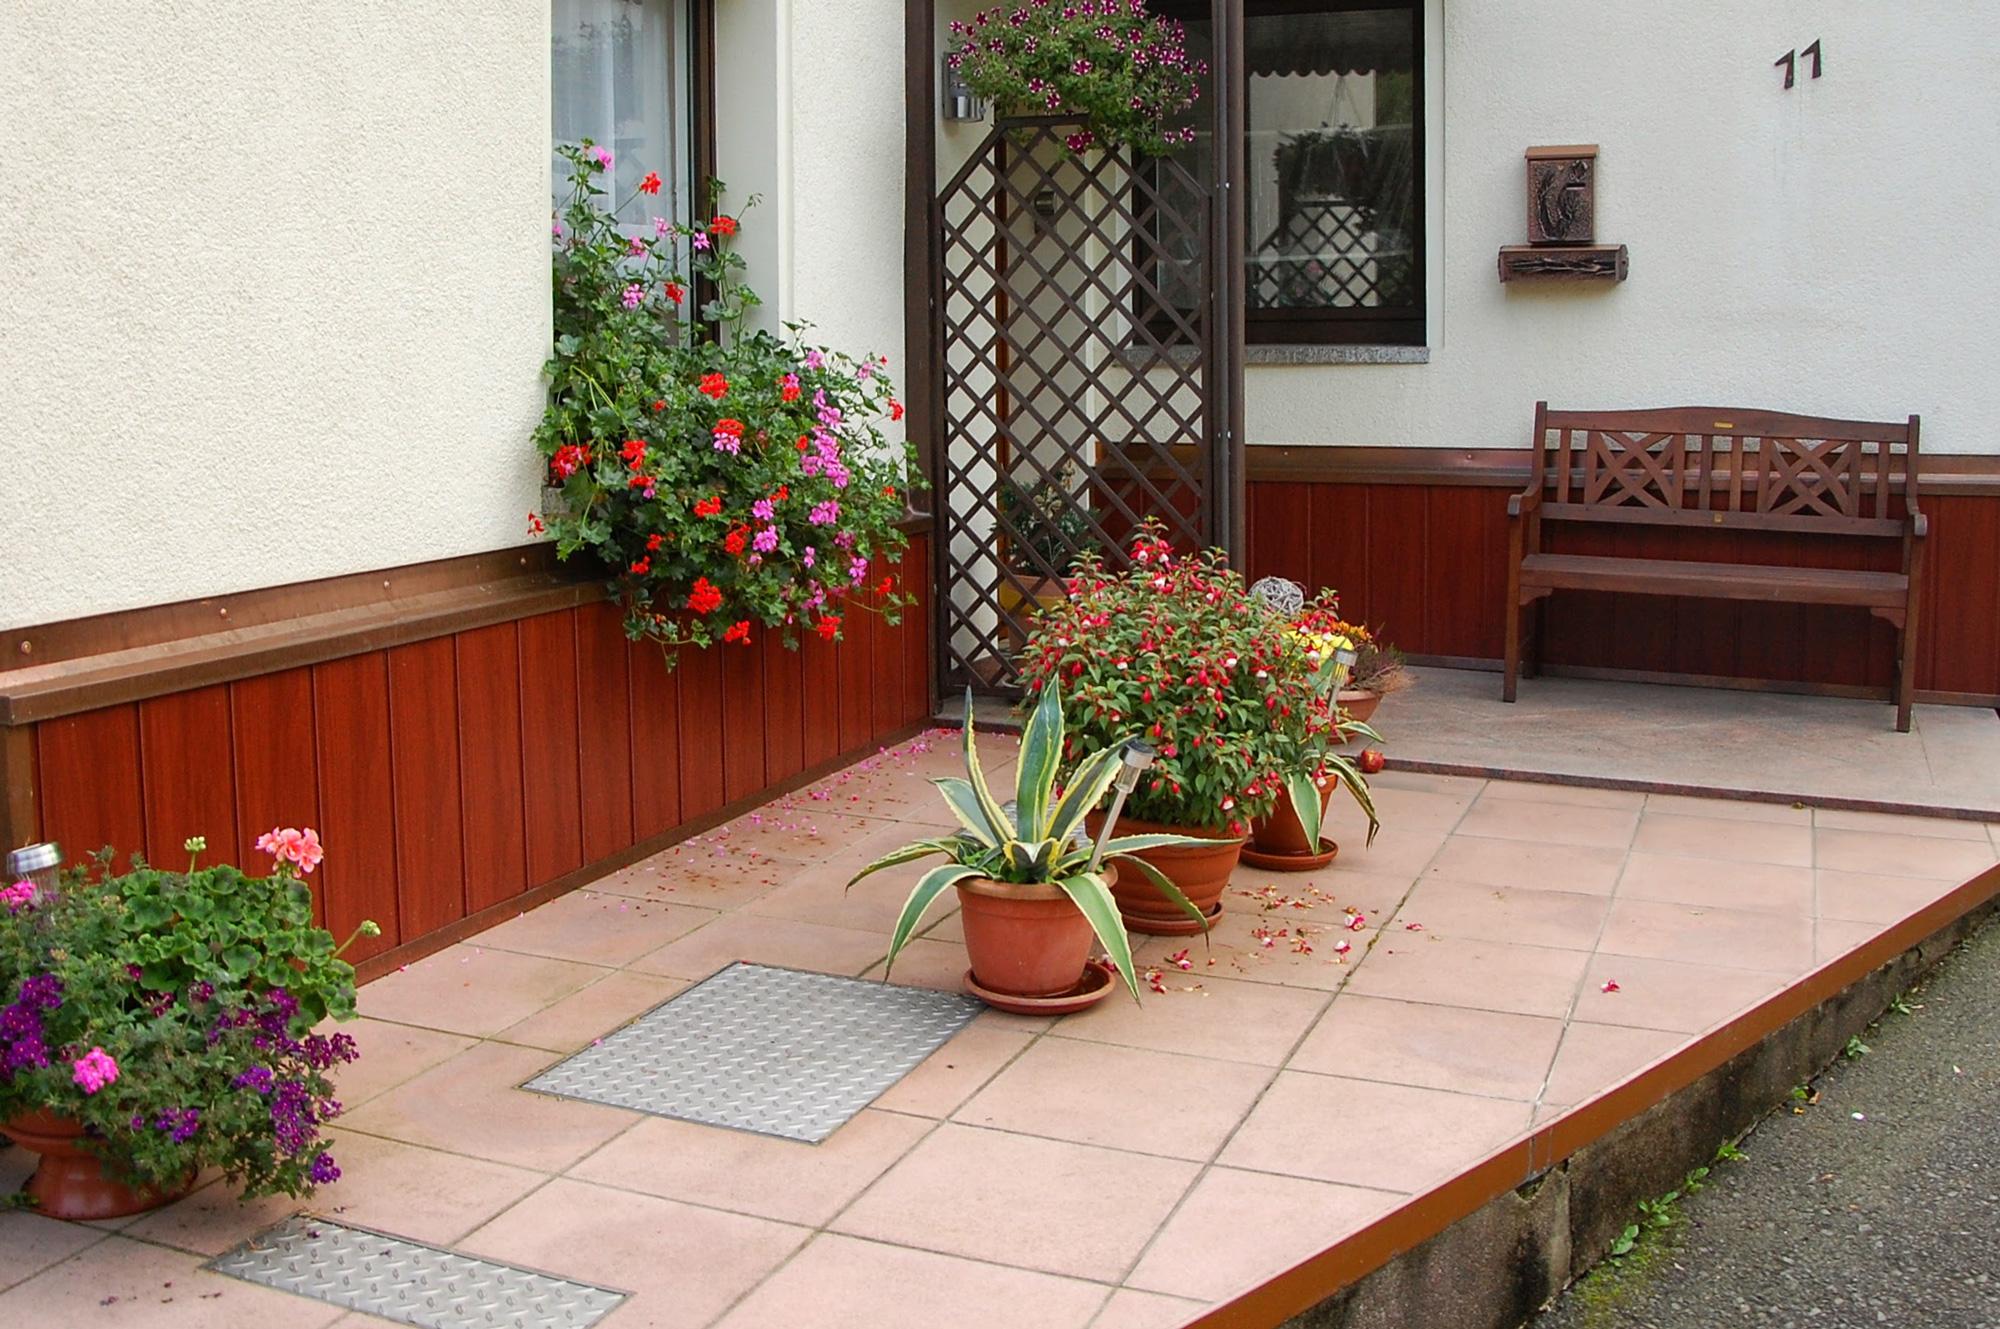 Blechprofile an Sockel und Fassade, Blankenberg, Saale-Orla-Kreis